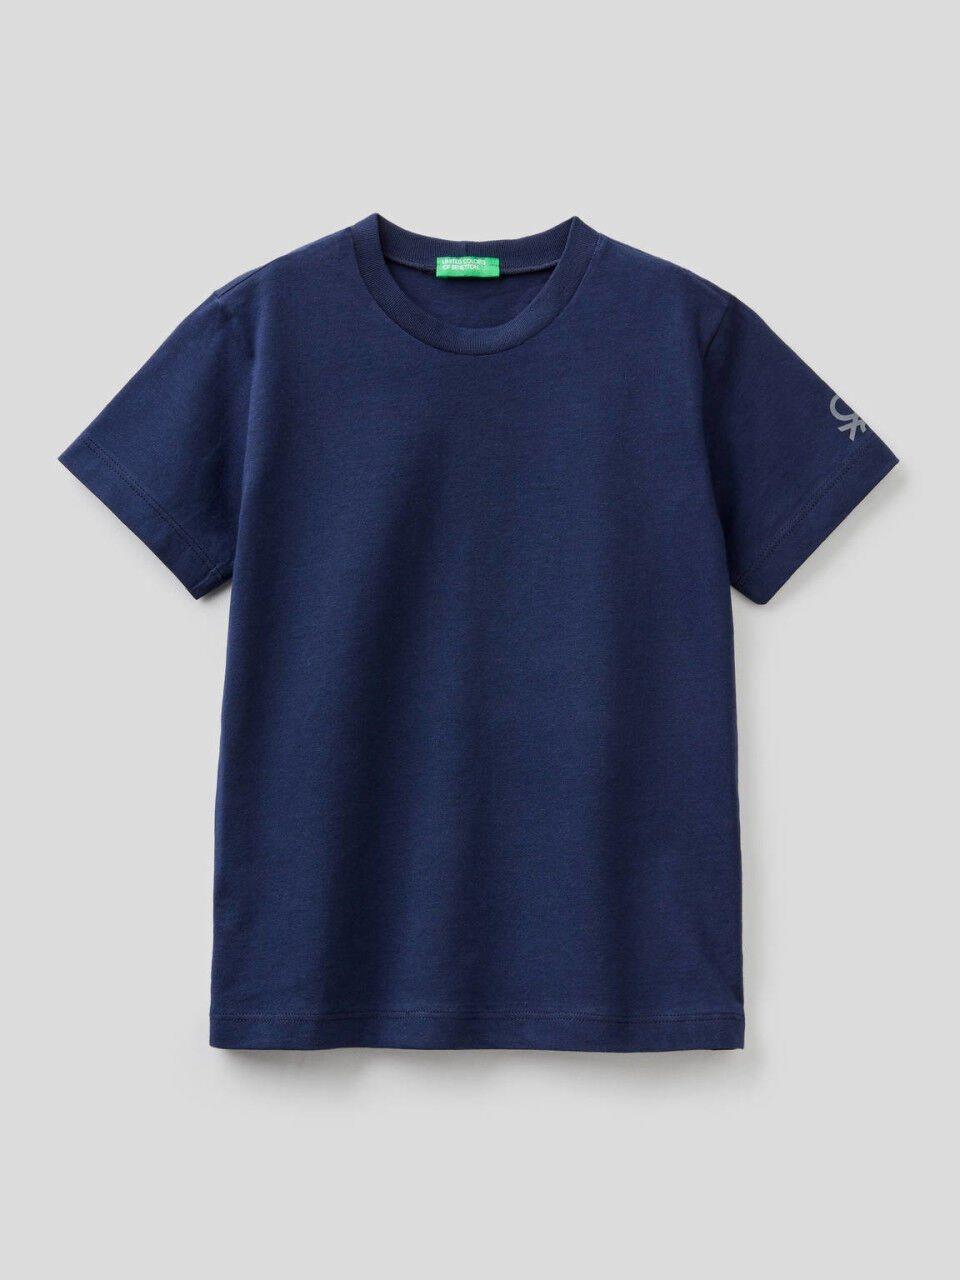 Catálogo United Colors of Benetton para niño Verano 2021